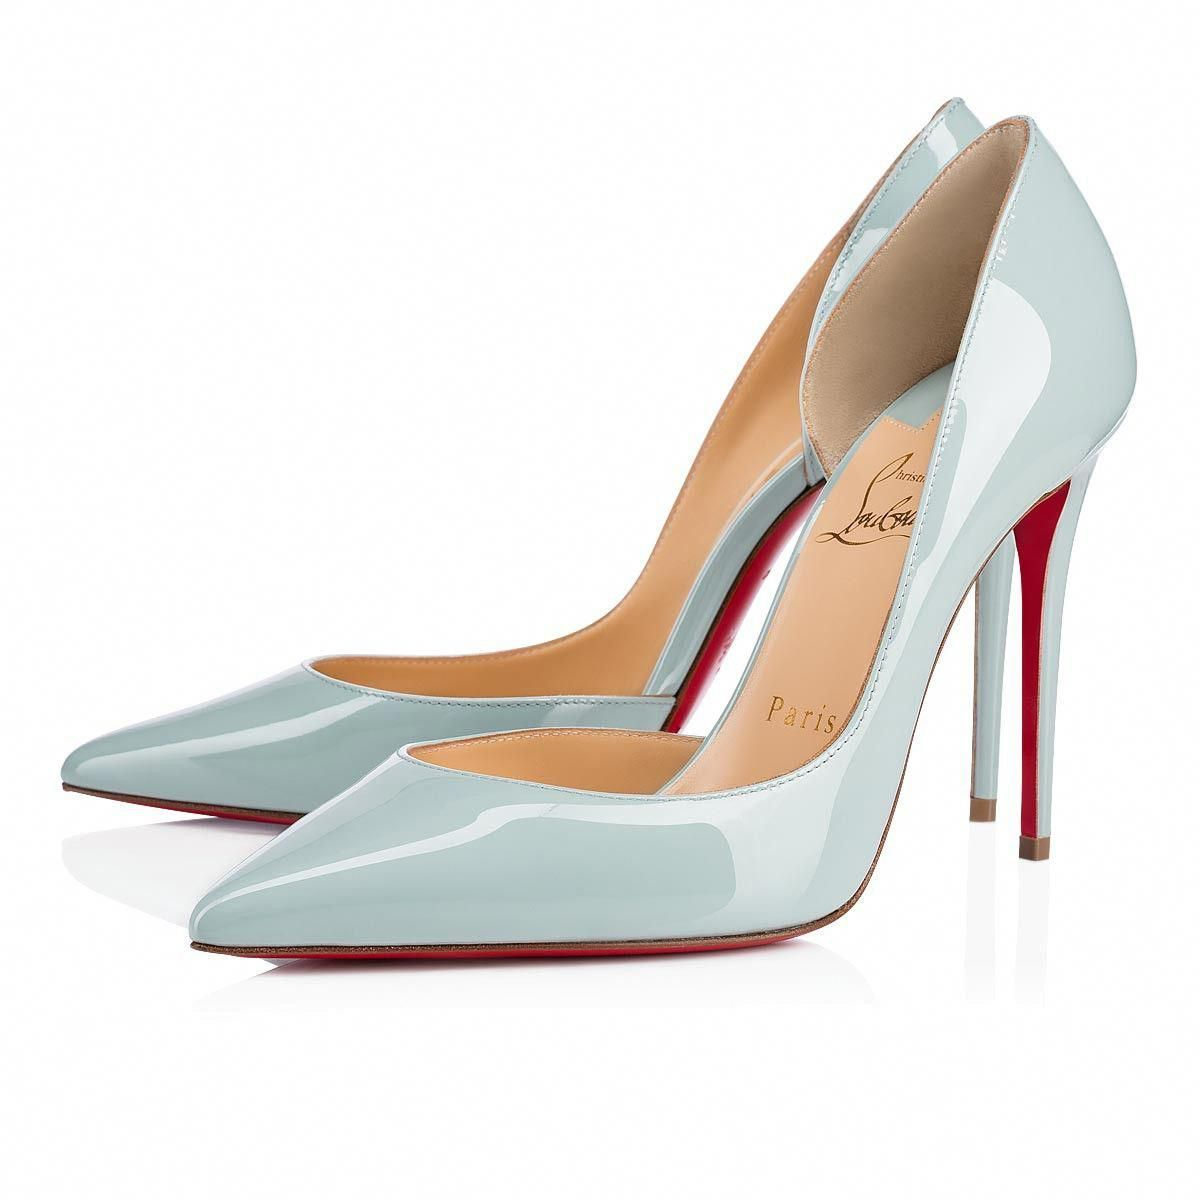 af2b4ef30f0 Shoes - Iriza - Christian Louboutin  ChristianLouboutin  ladiesleatherpurse